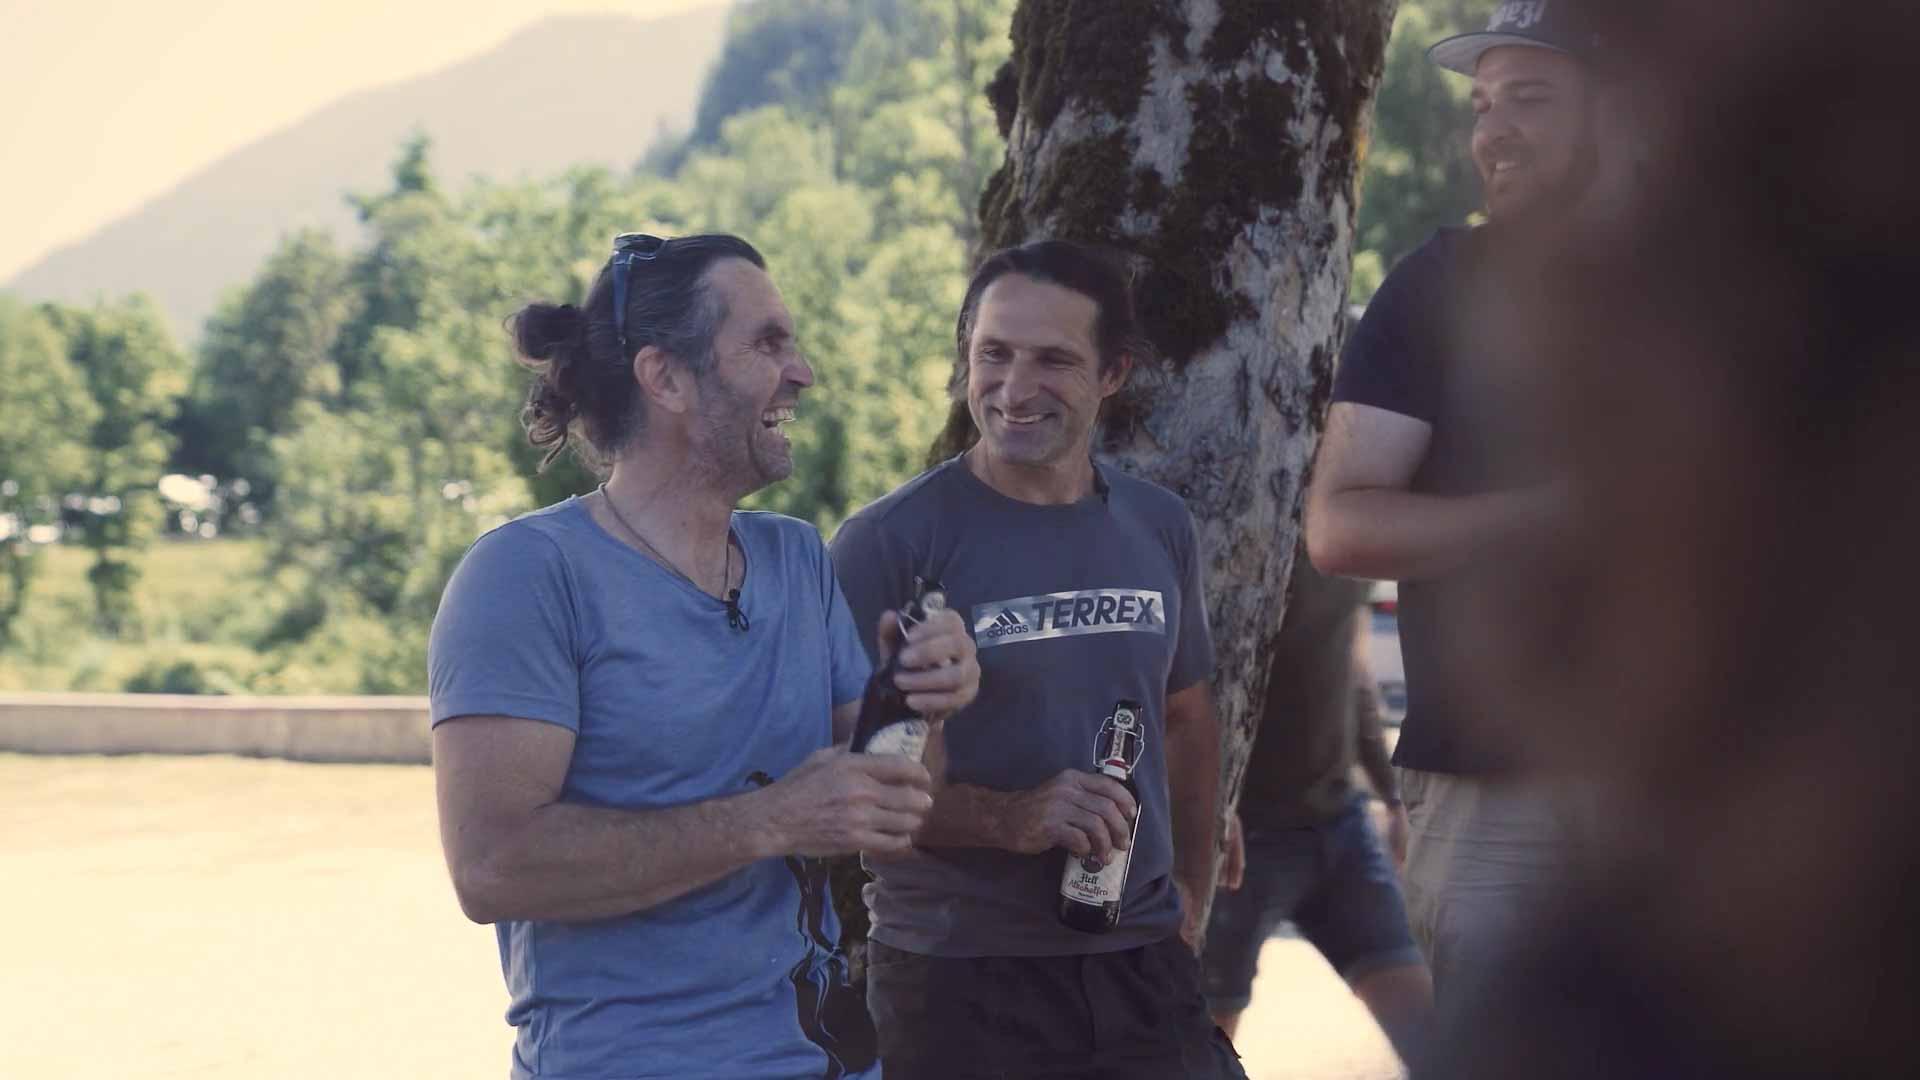 Hacker Pschorr: Spezl Tour 2019 mit den Huber Buam